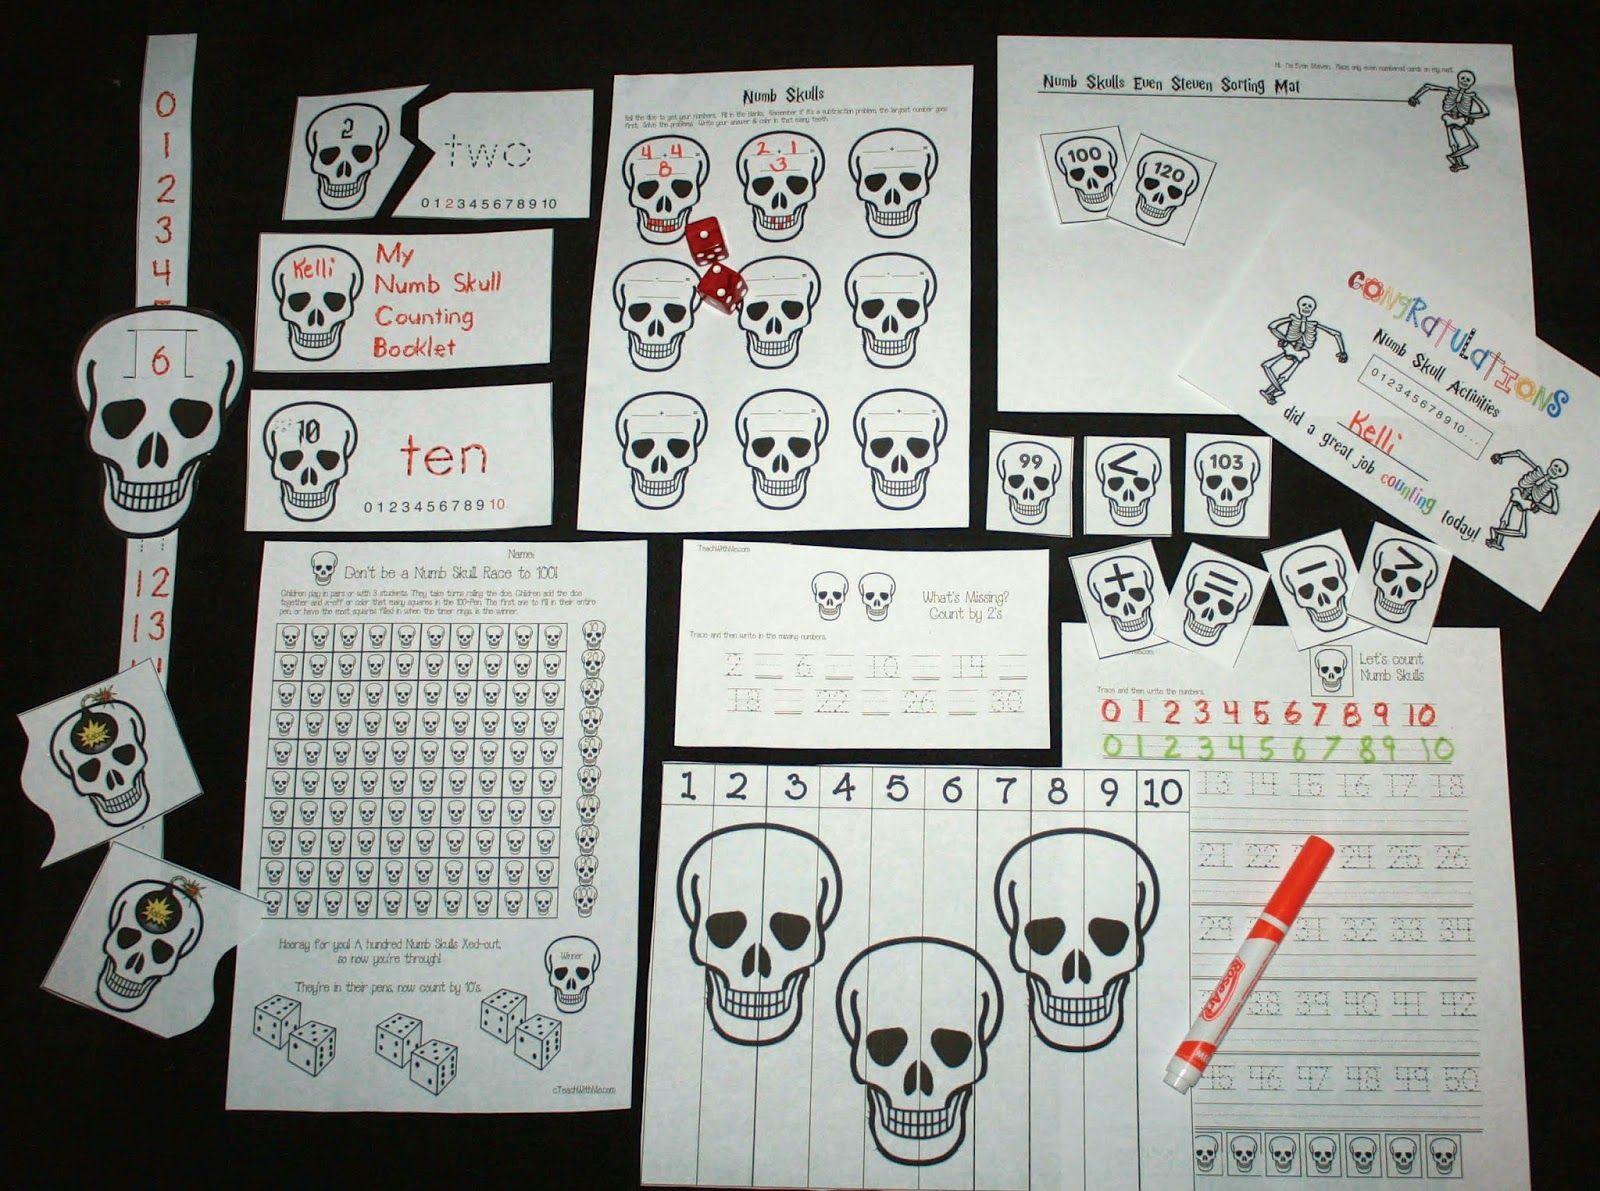 Common Core Skeleton Math Packet Math Packets Math Activities Free Math Activity [ 1191 x 1600 Pixel ]